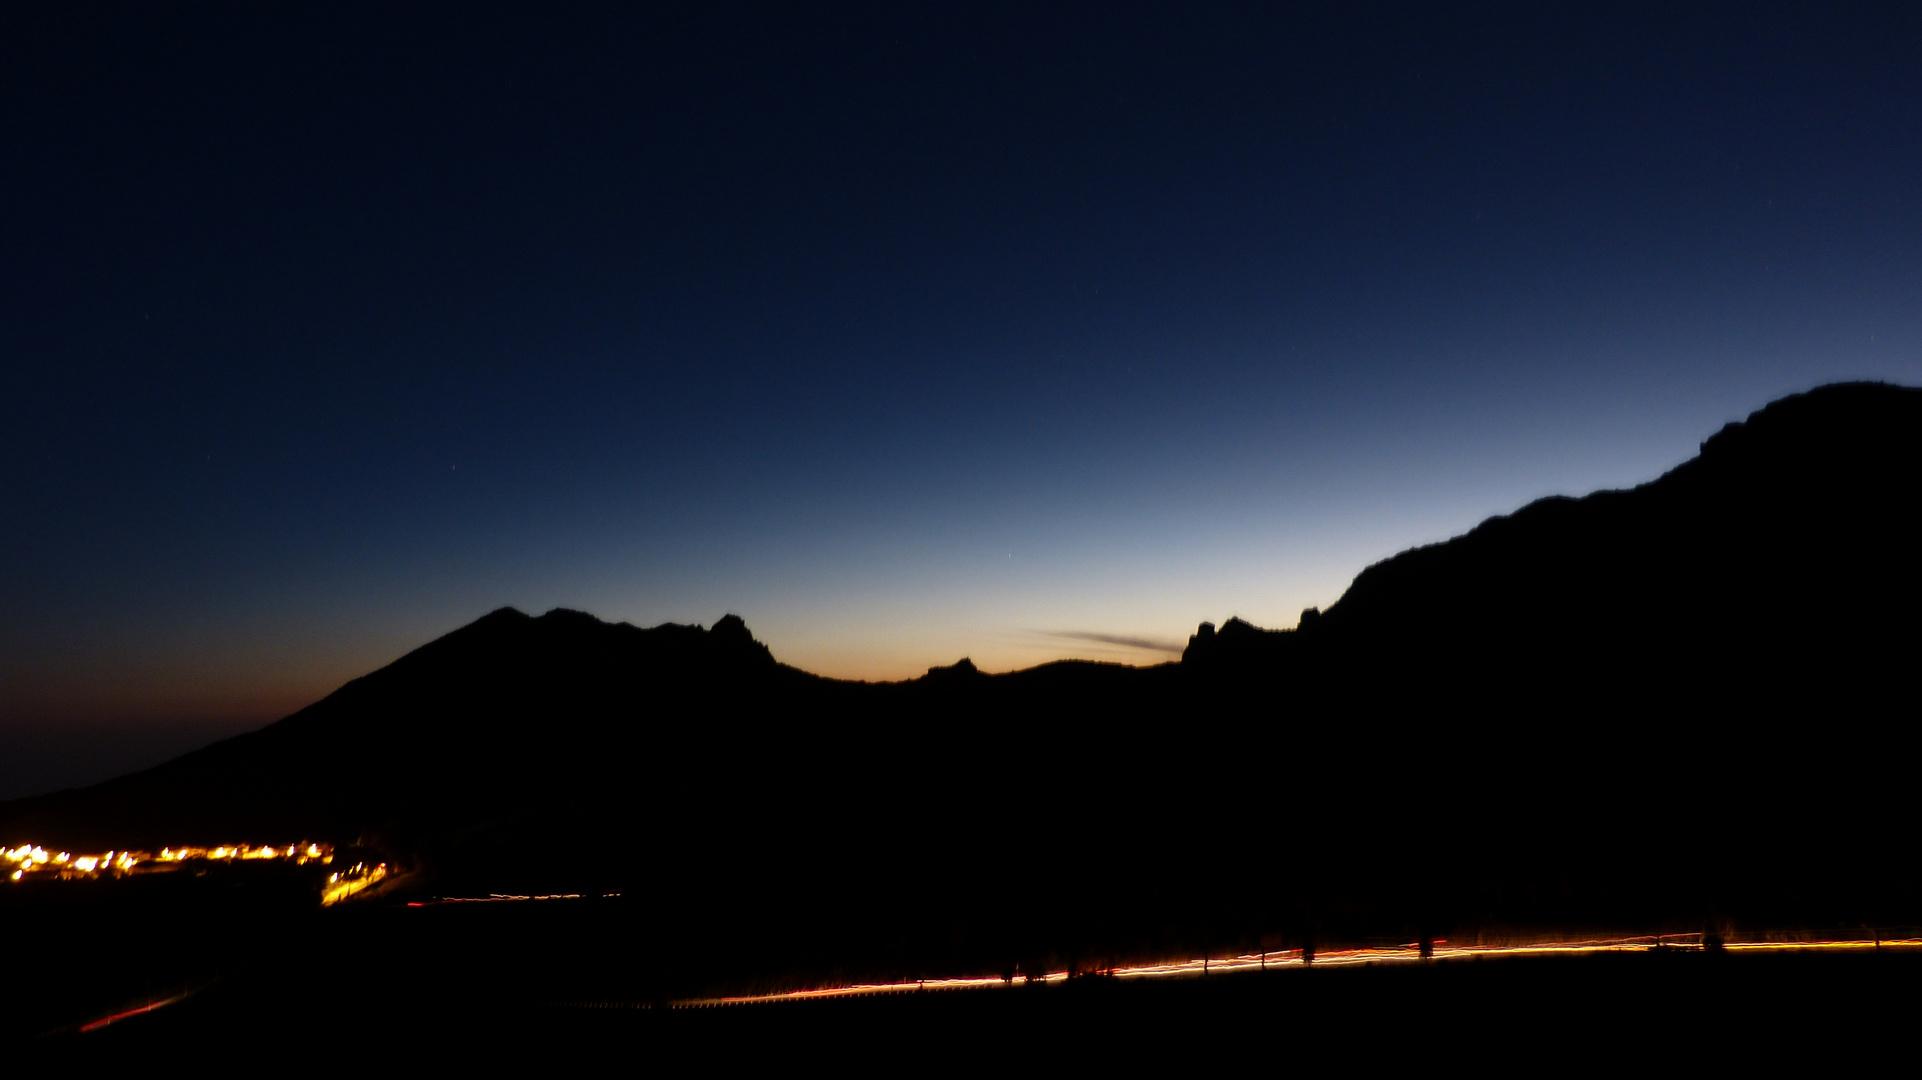 Sonnenuntergang in Teneriffa